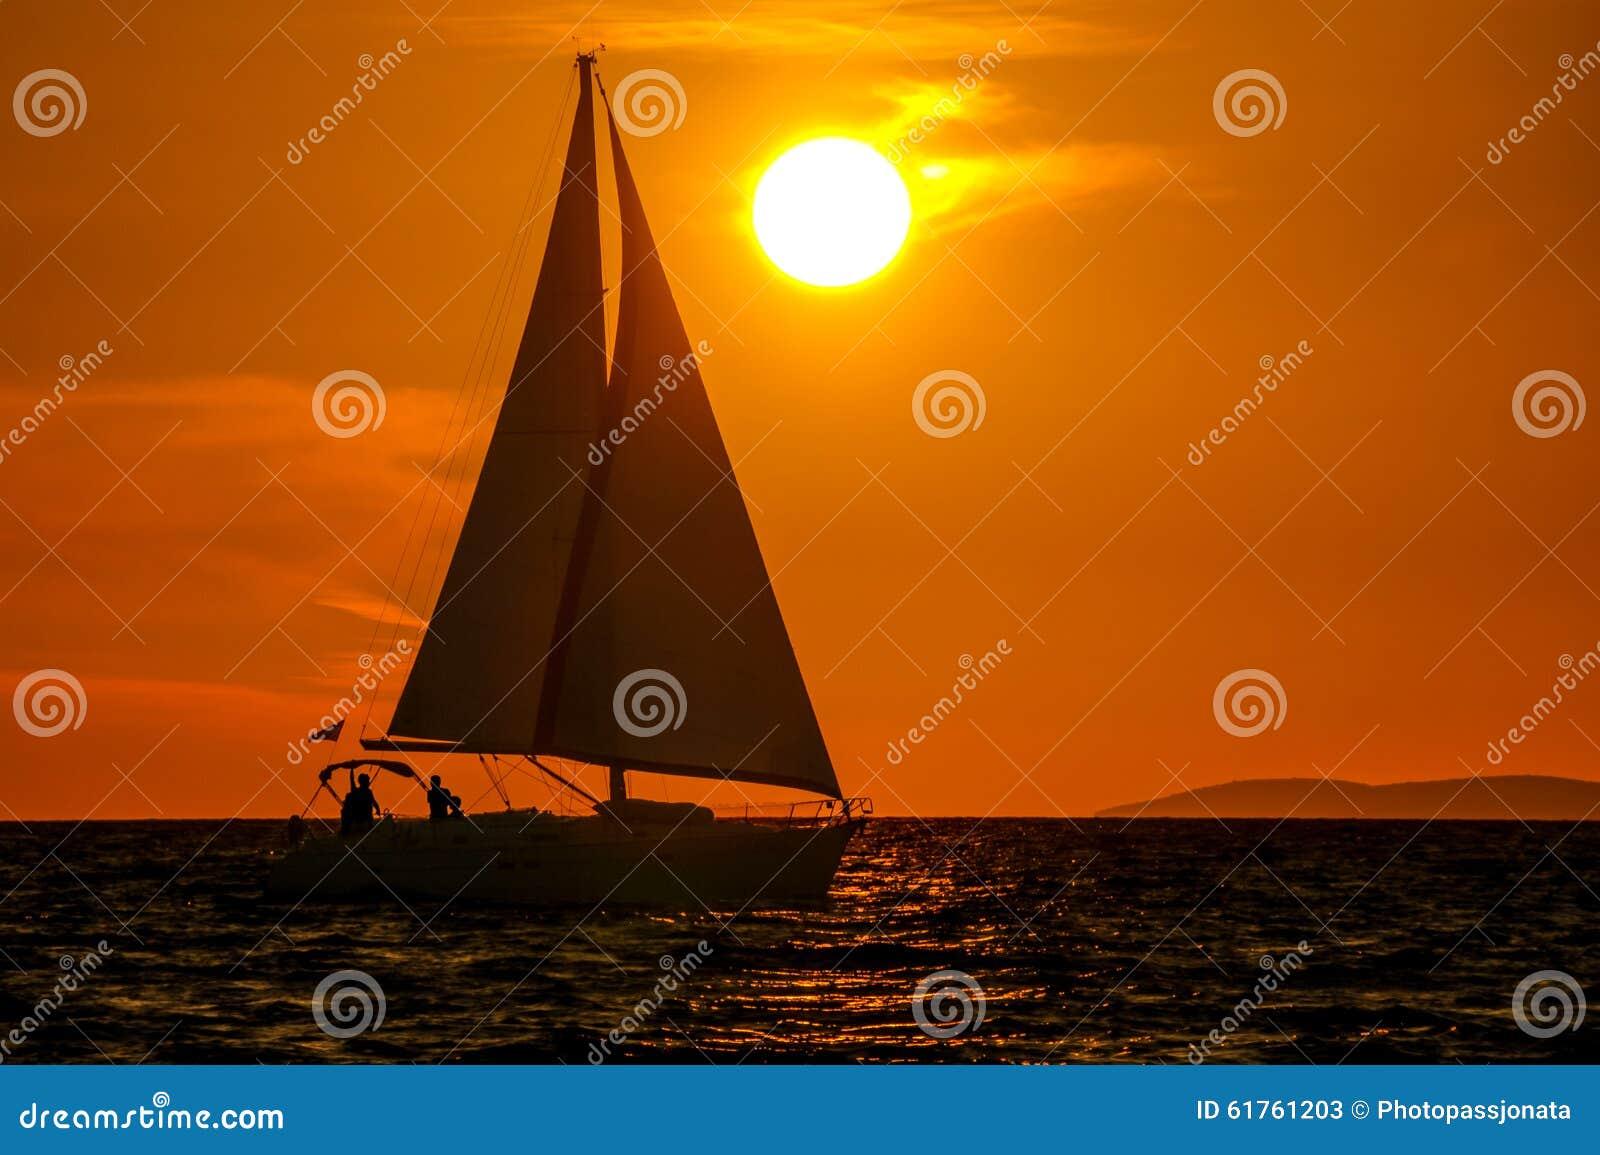 Zeilboot-zonsondergang-oranje hemel